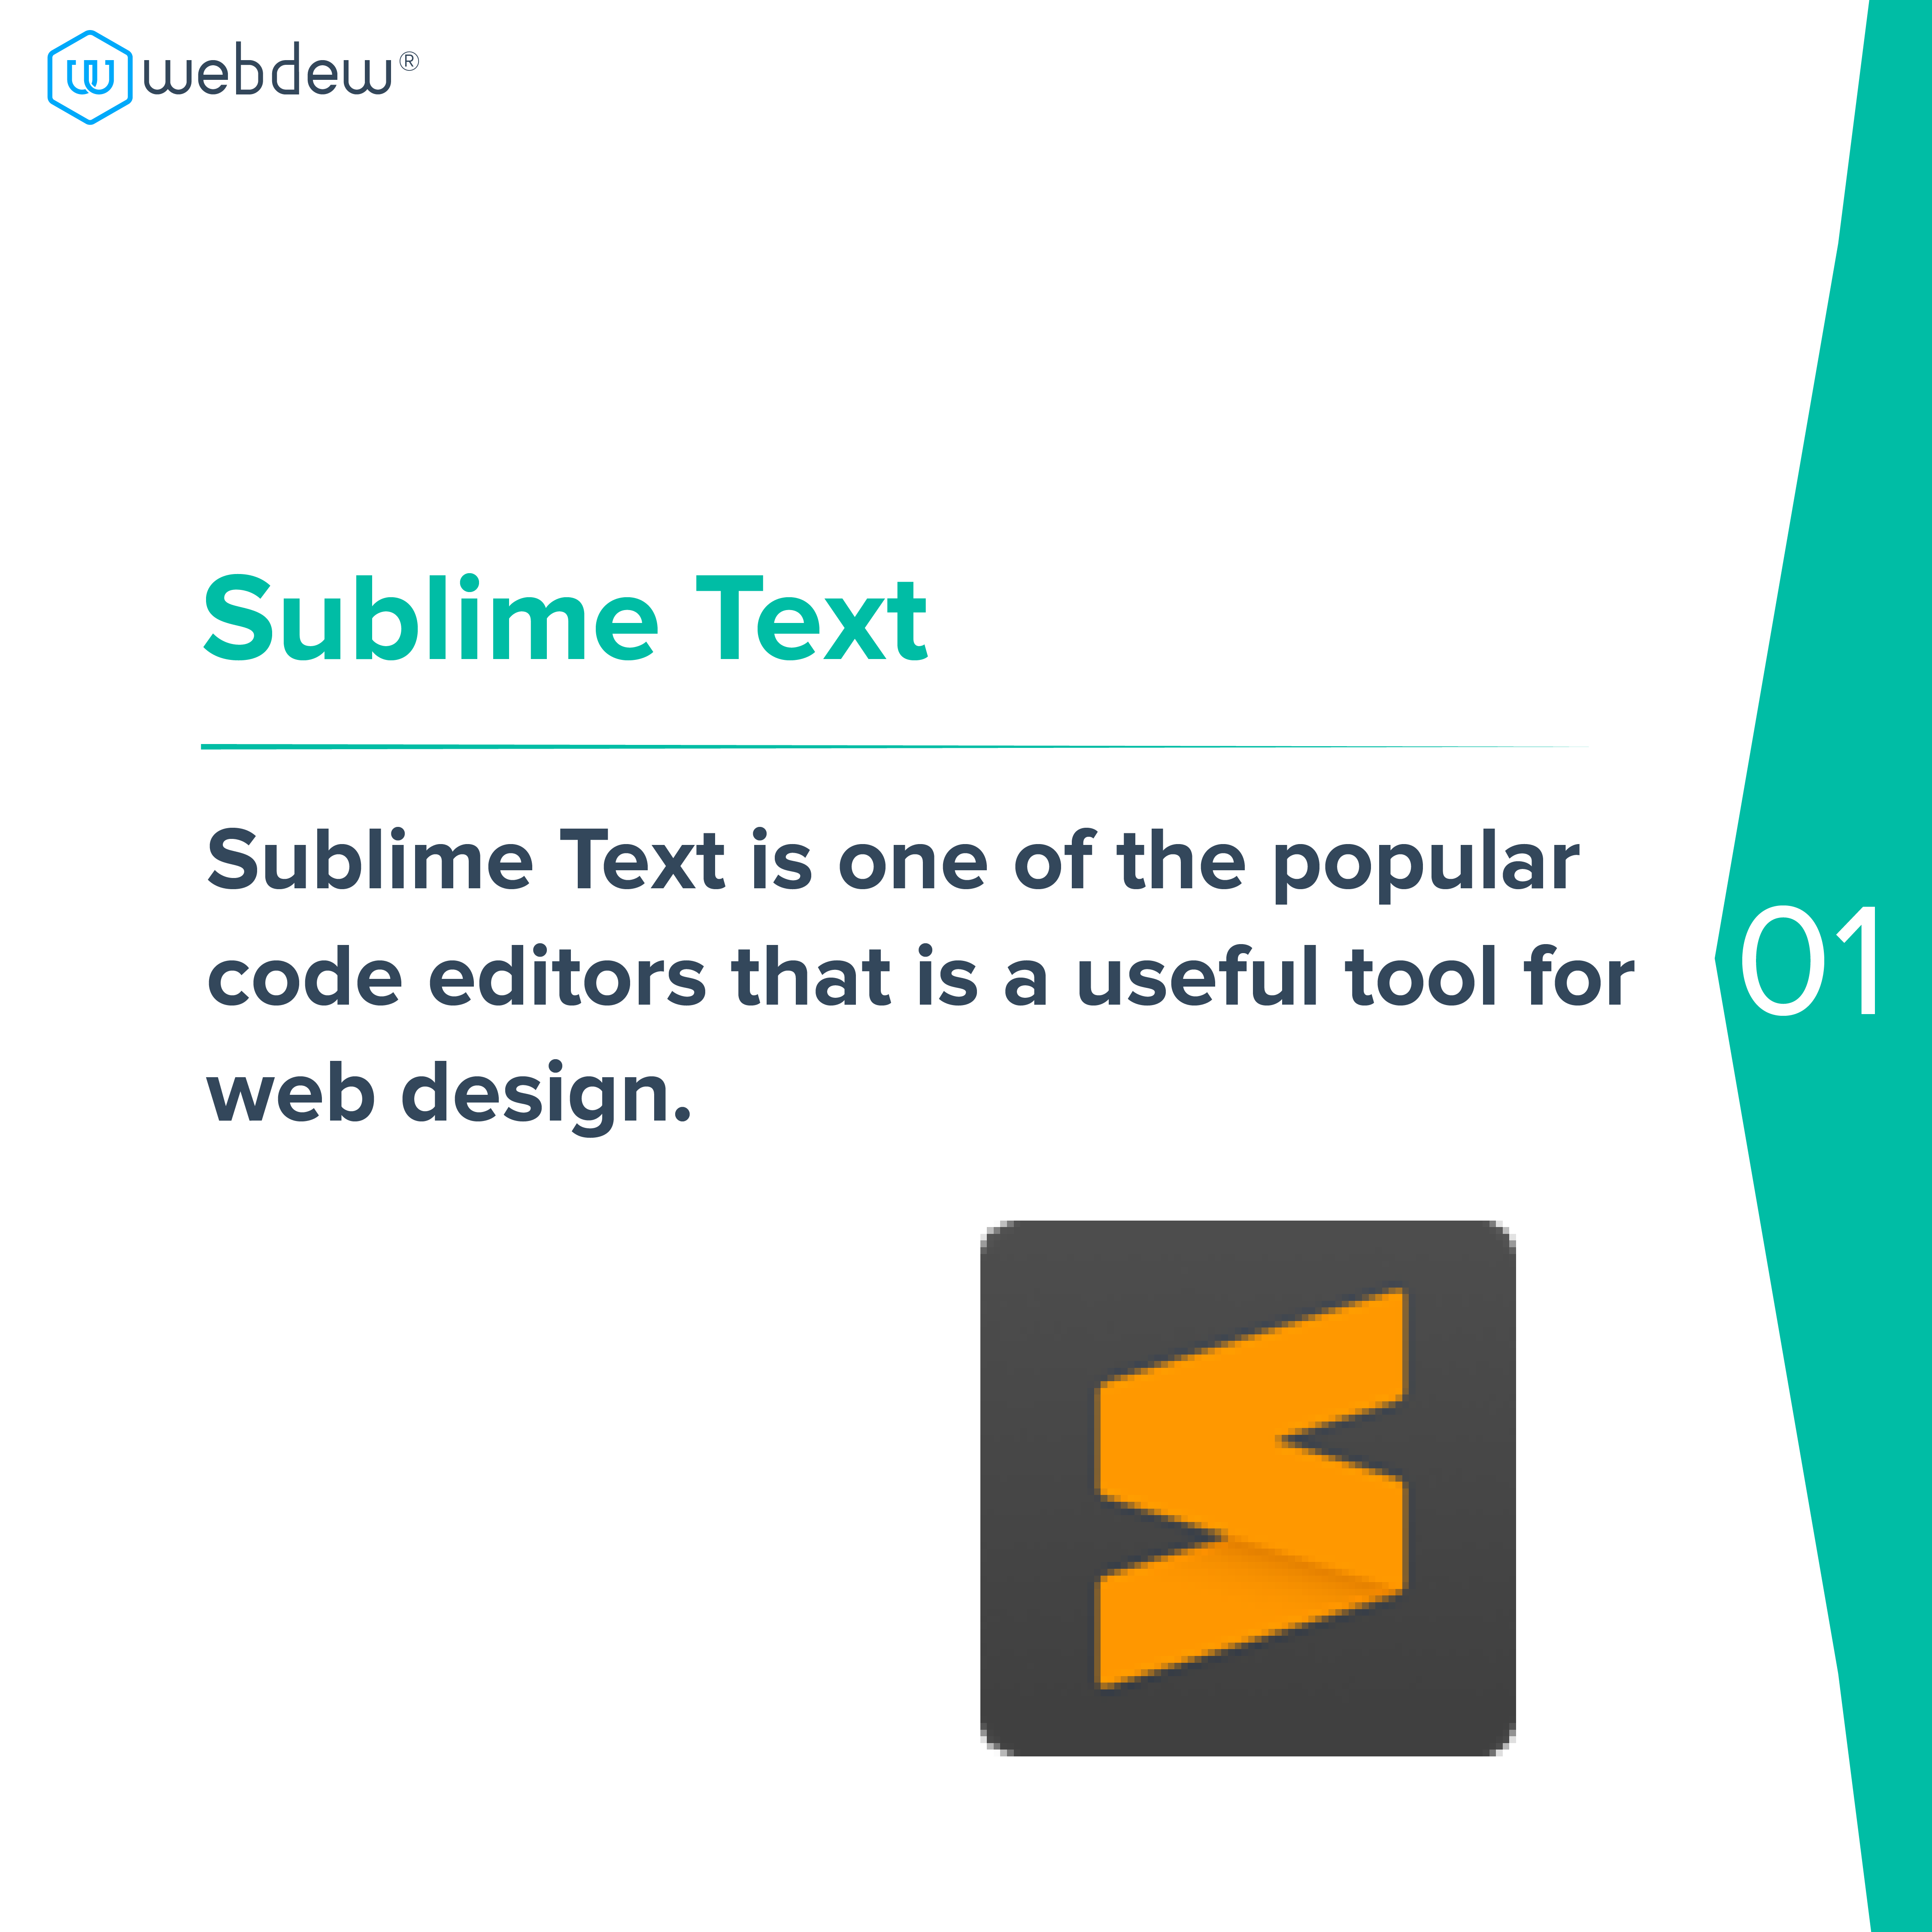 sublime-web-development-tool